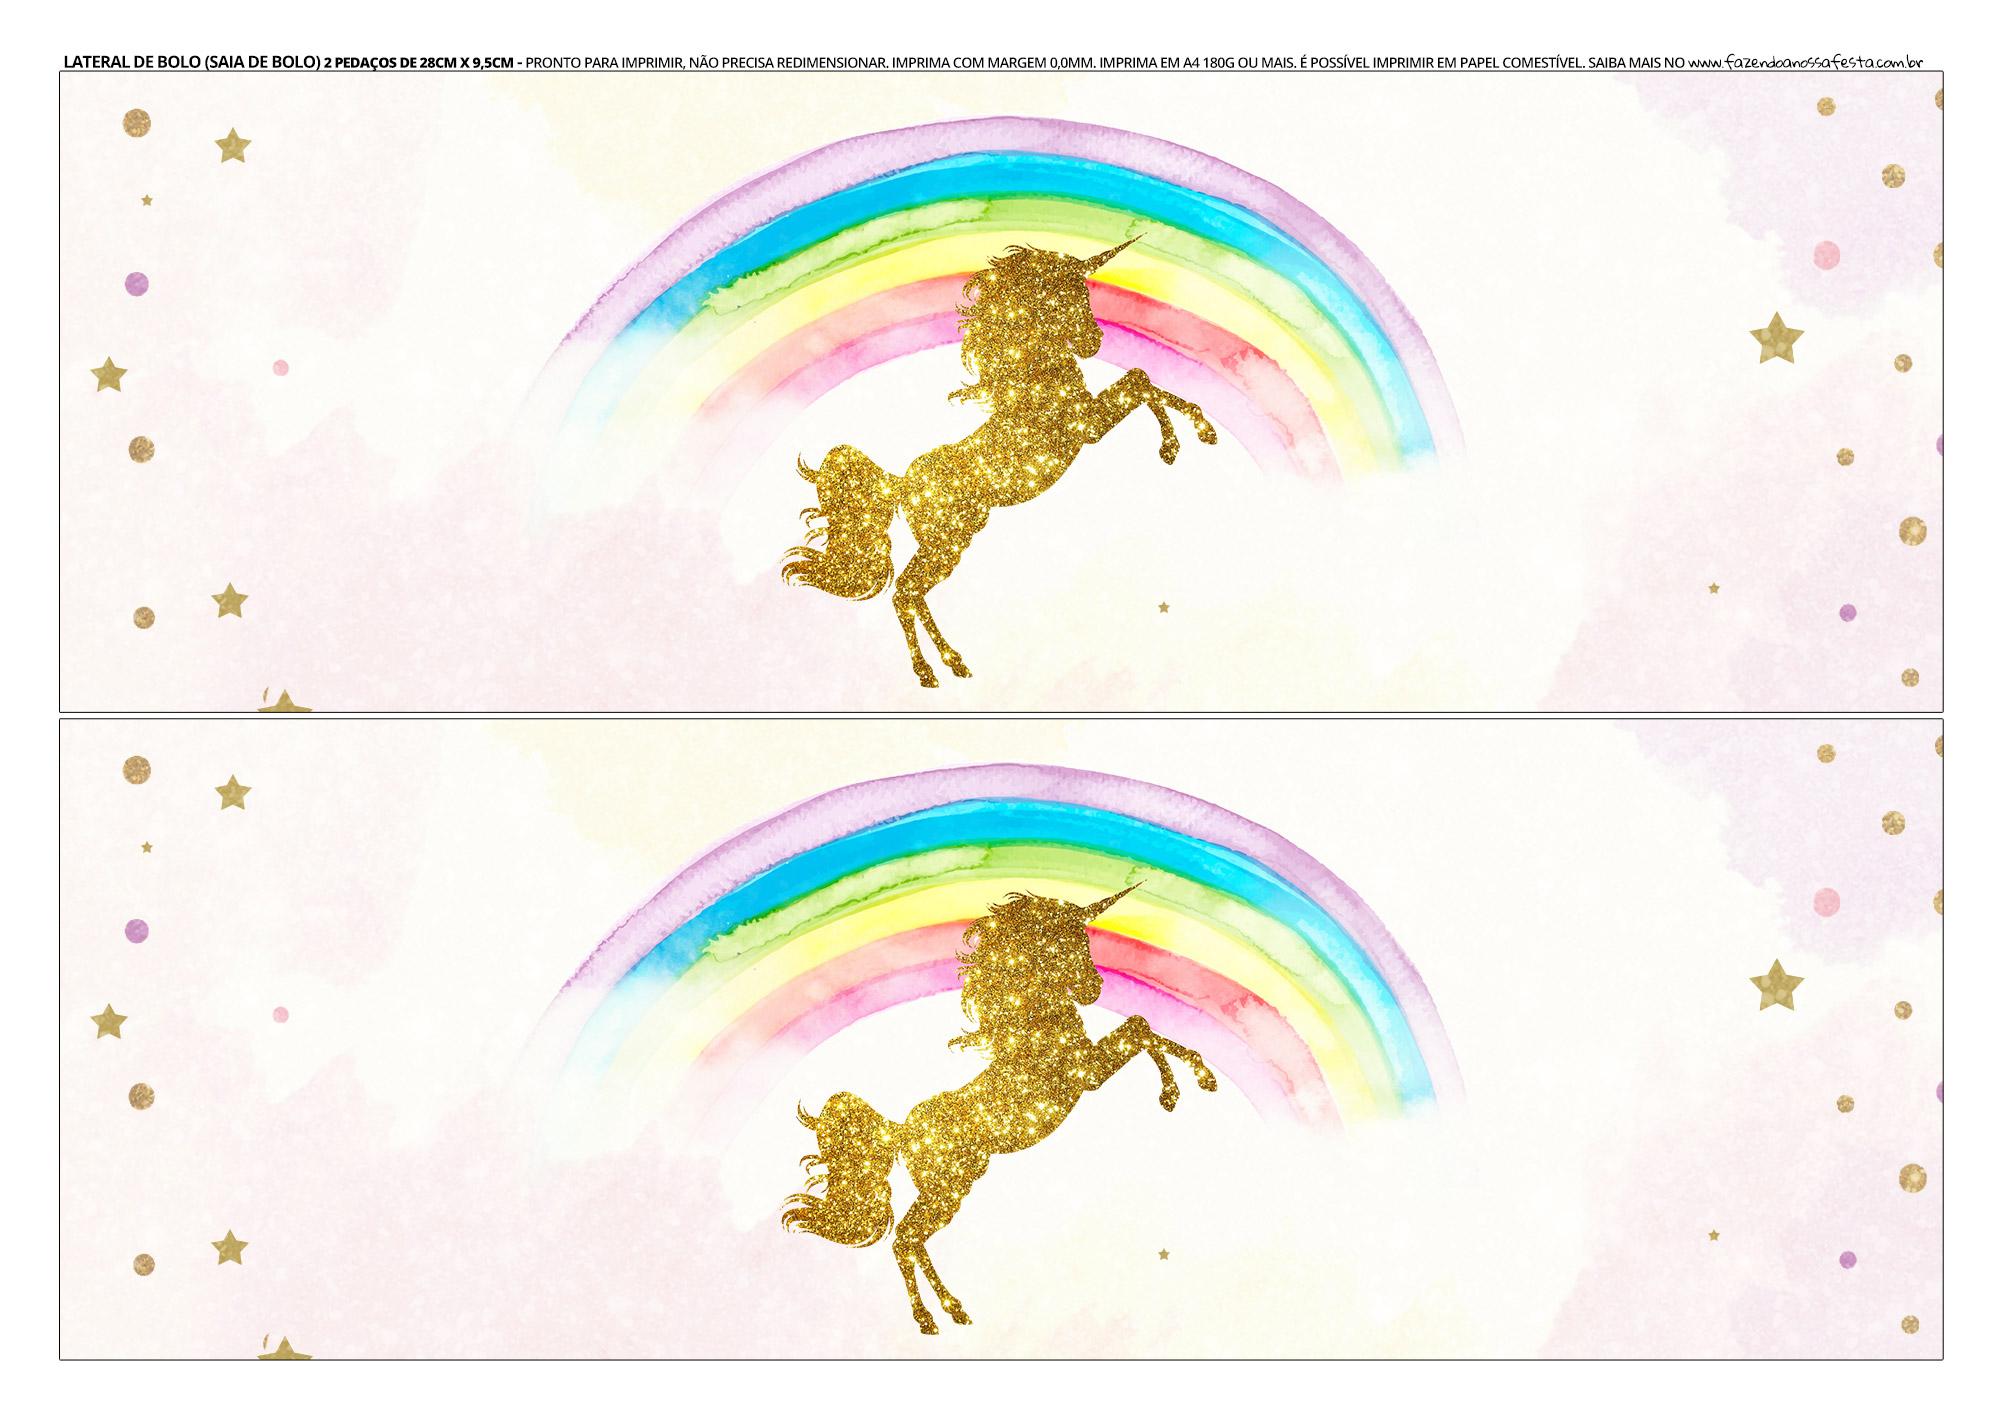 Faixa lateral de bolo Unicornio